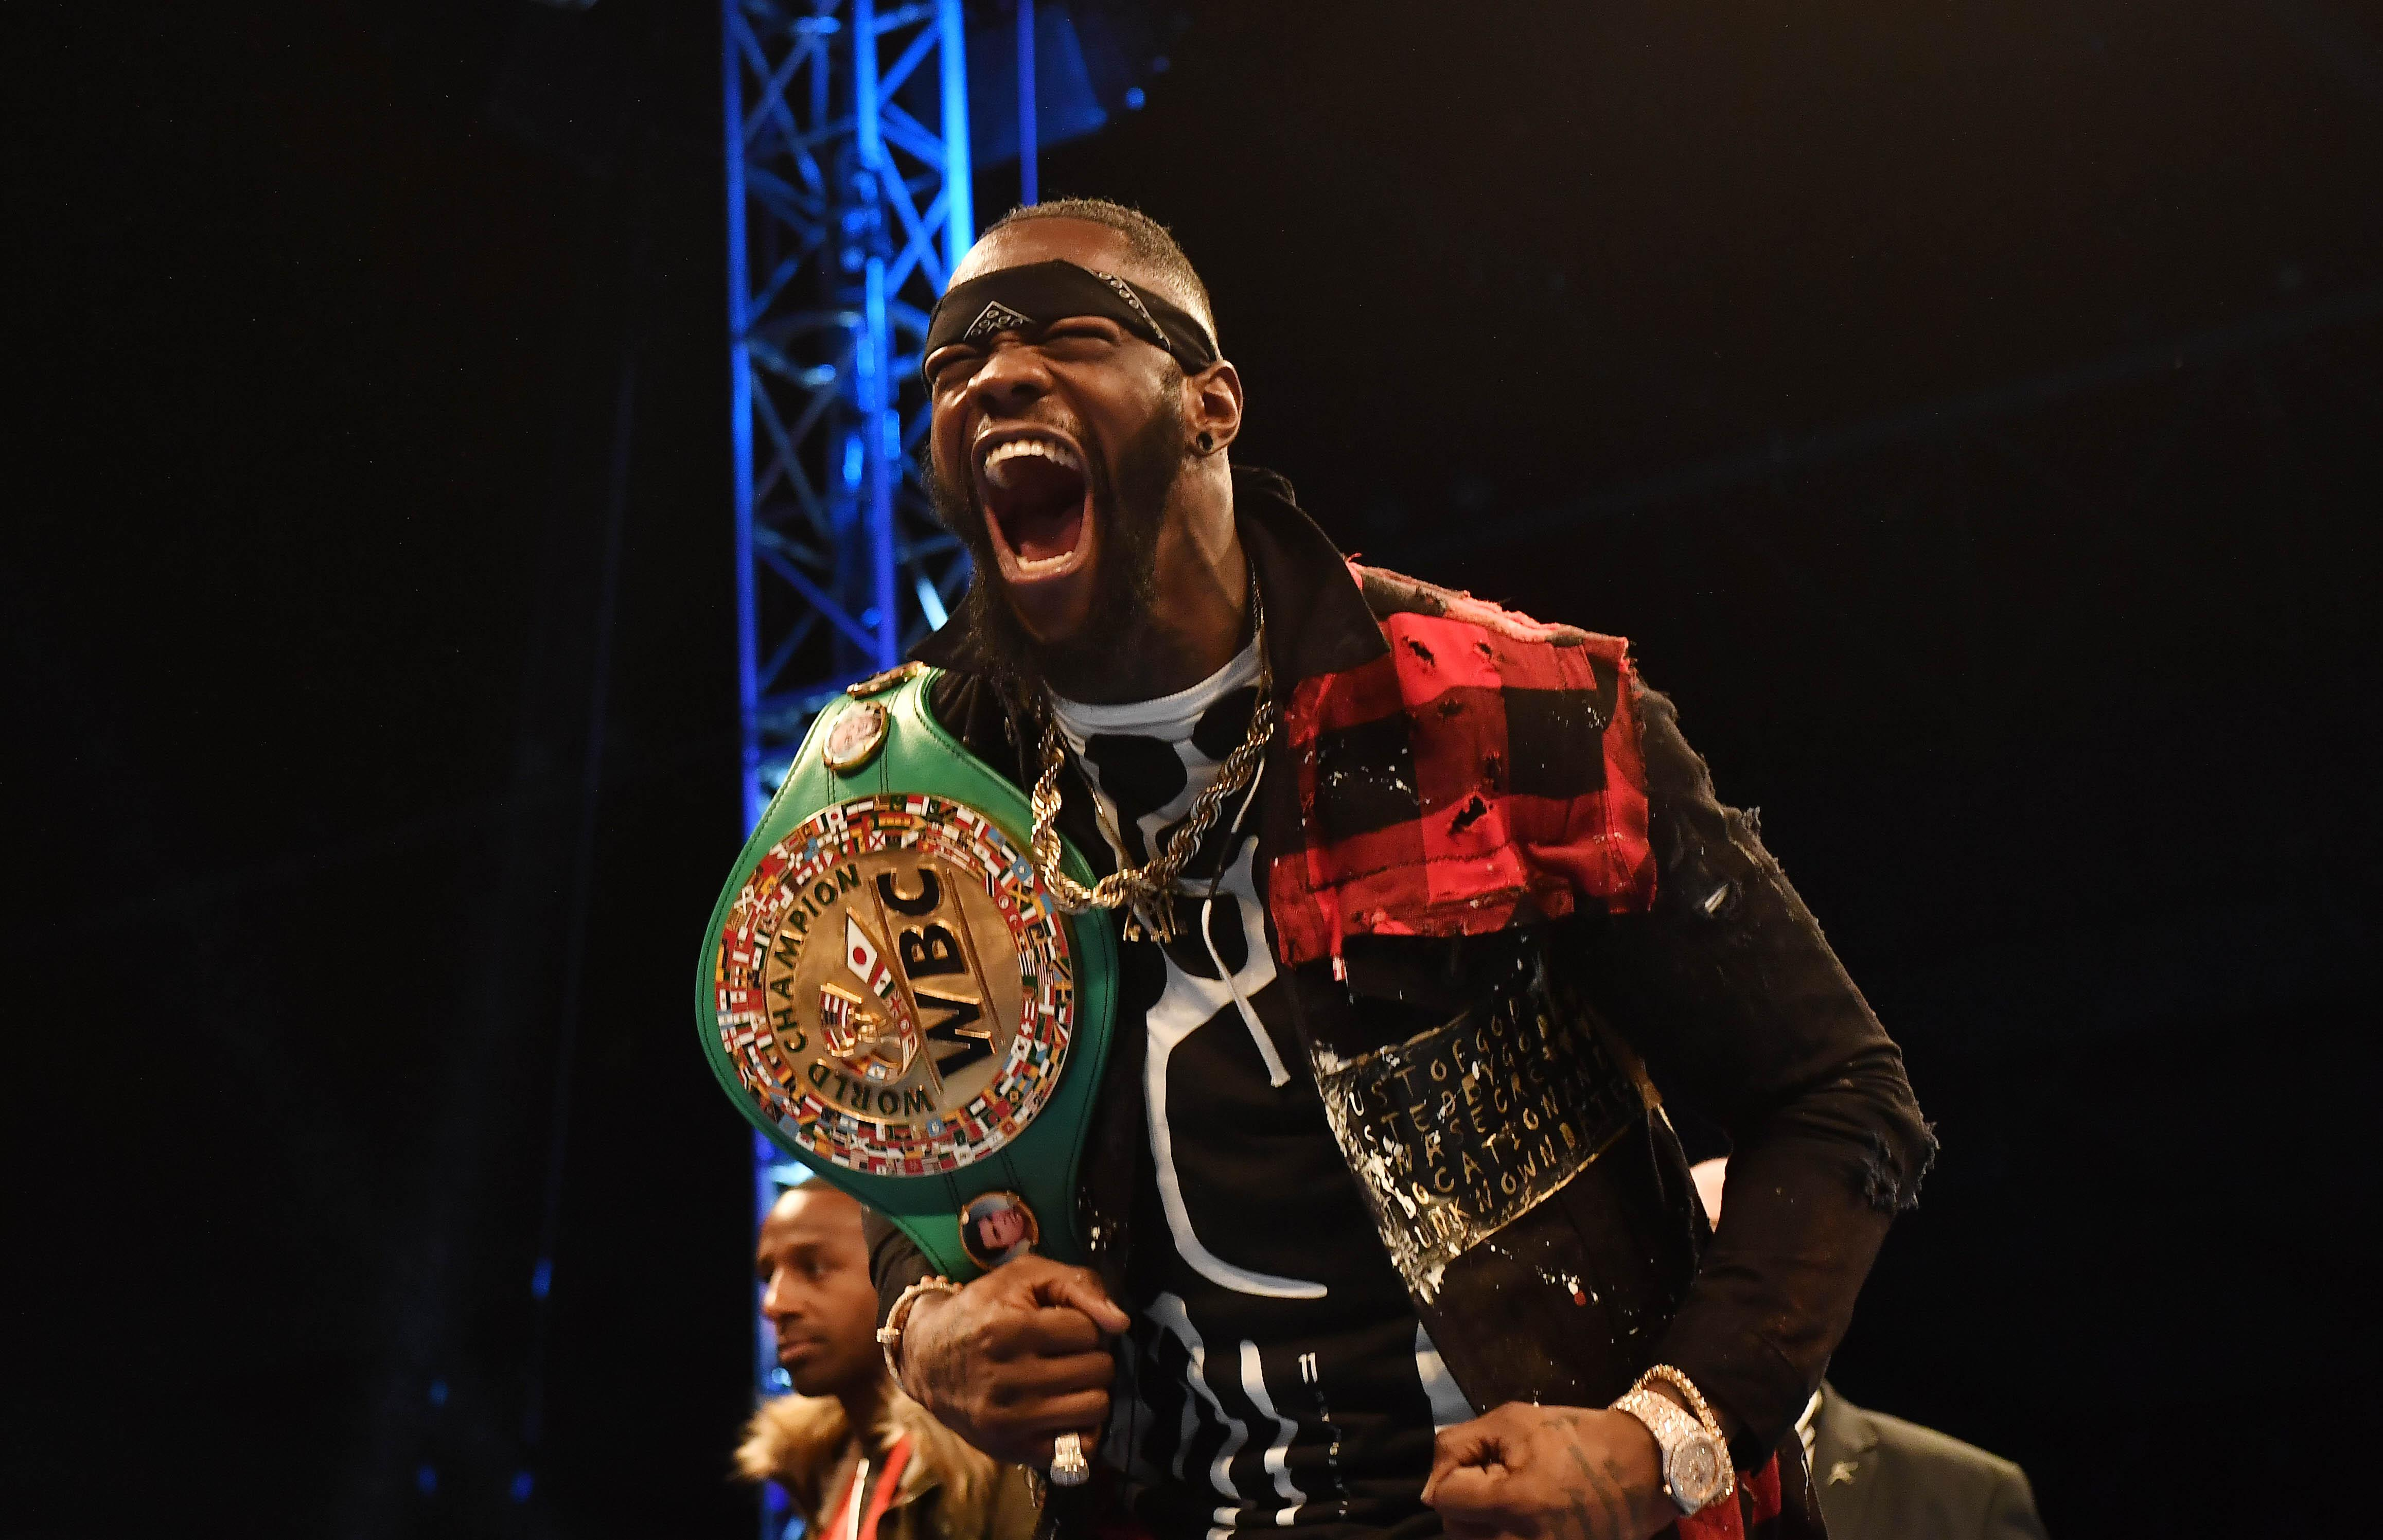 Deontay Wilder holds the illusive WBC title belt